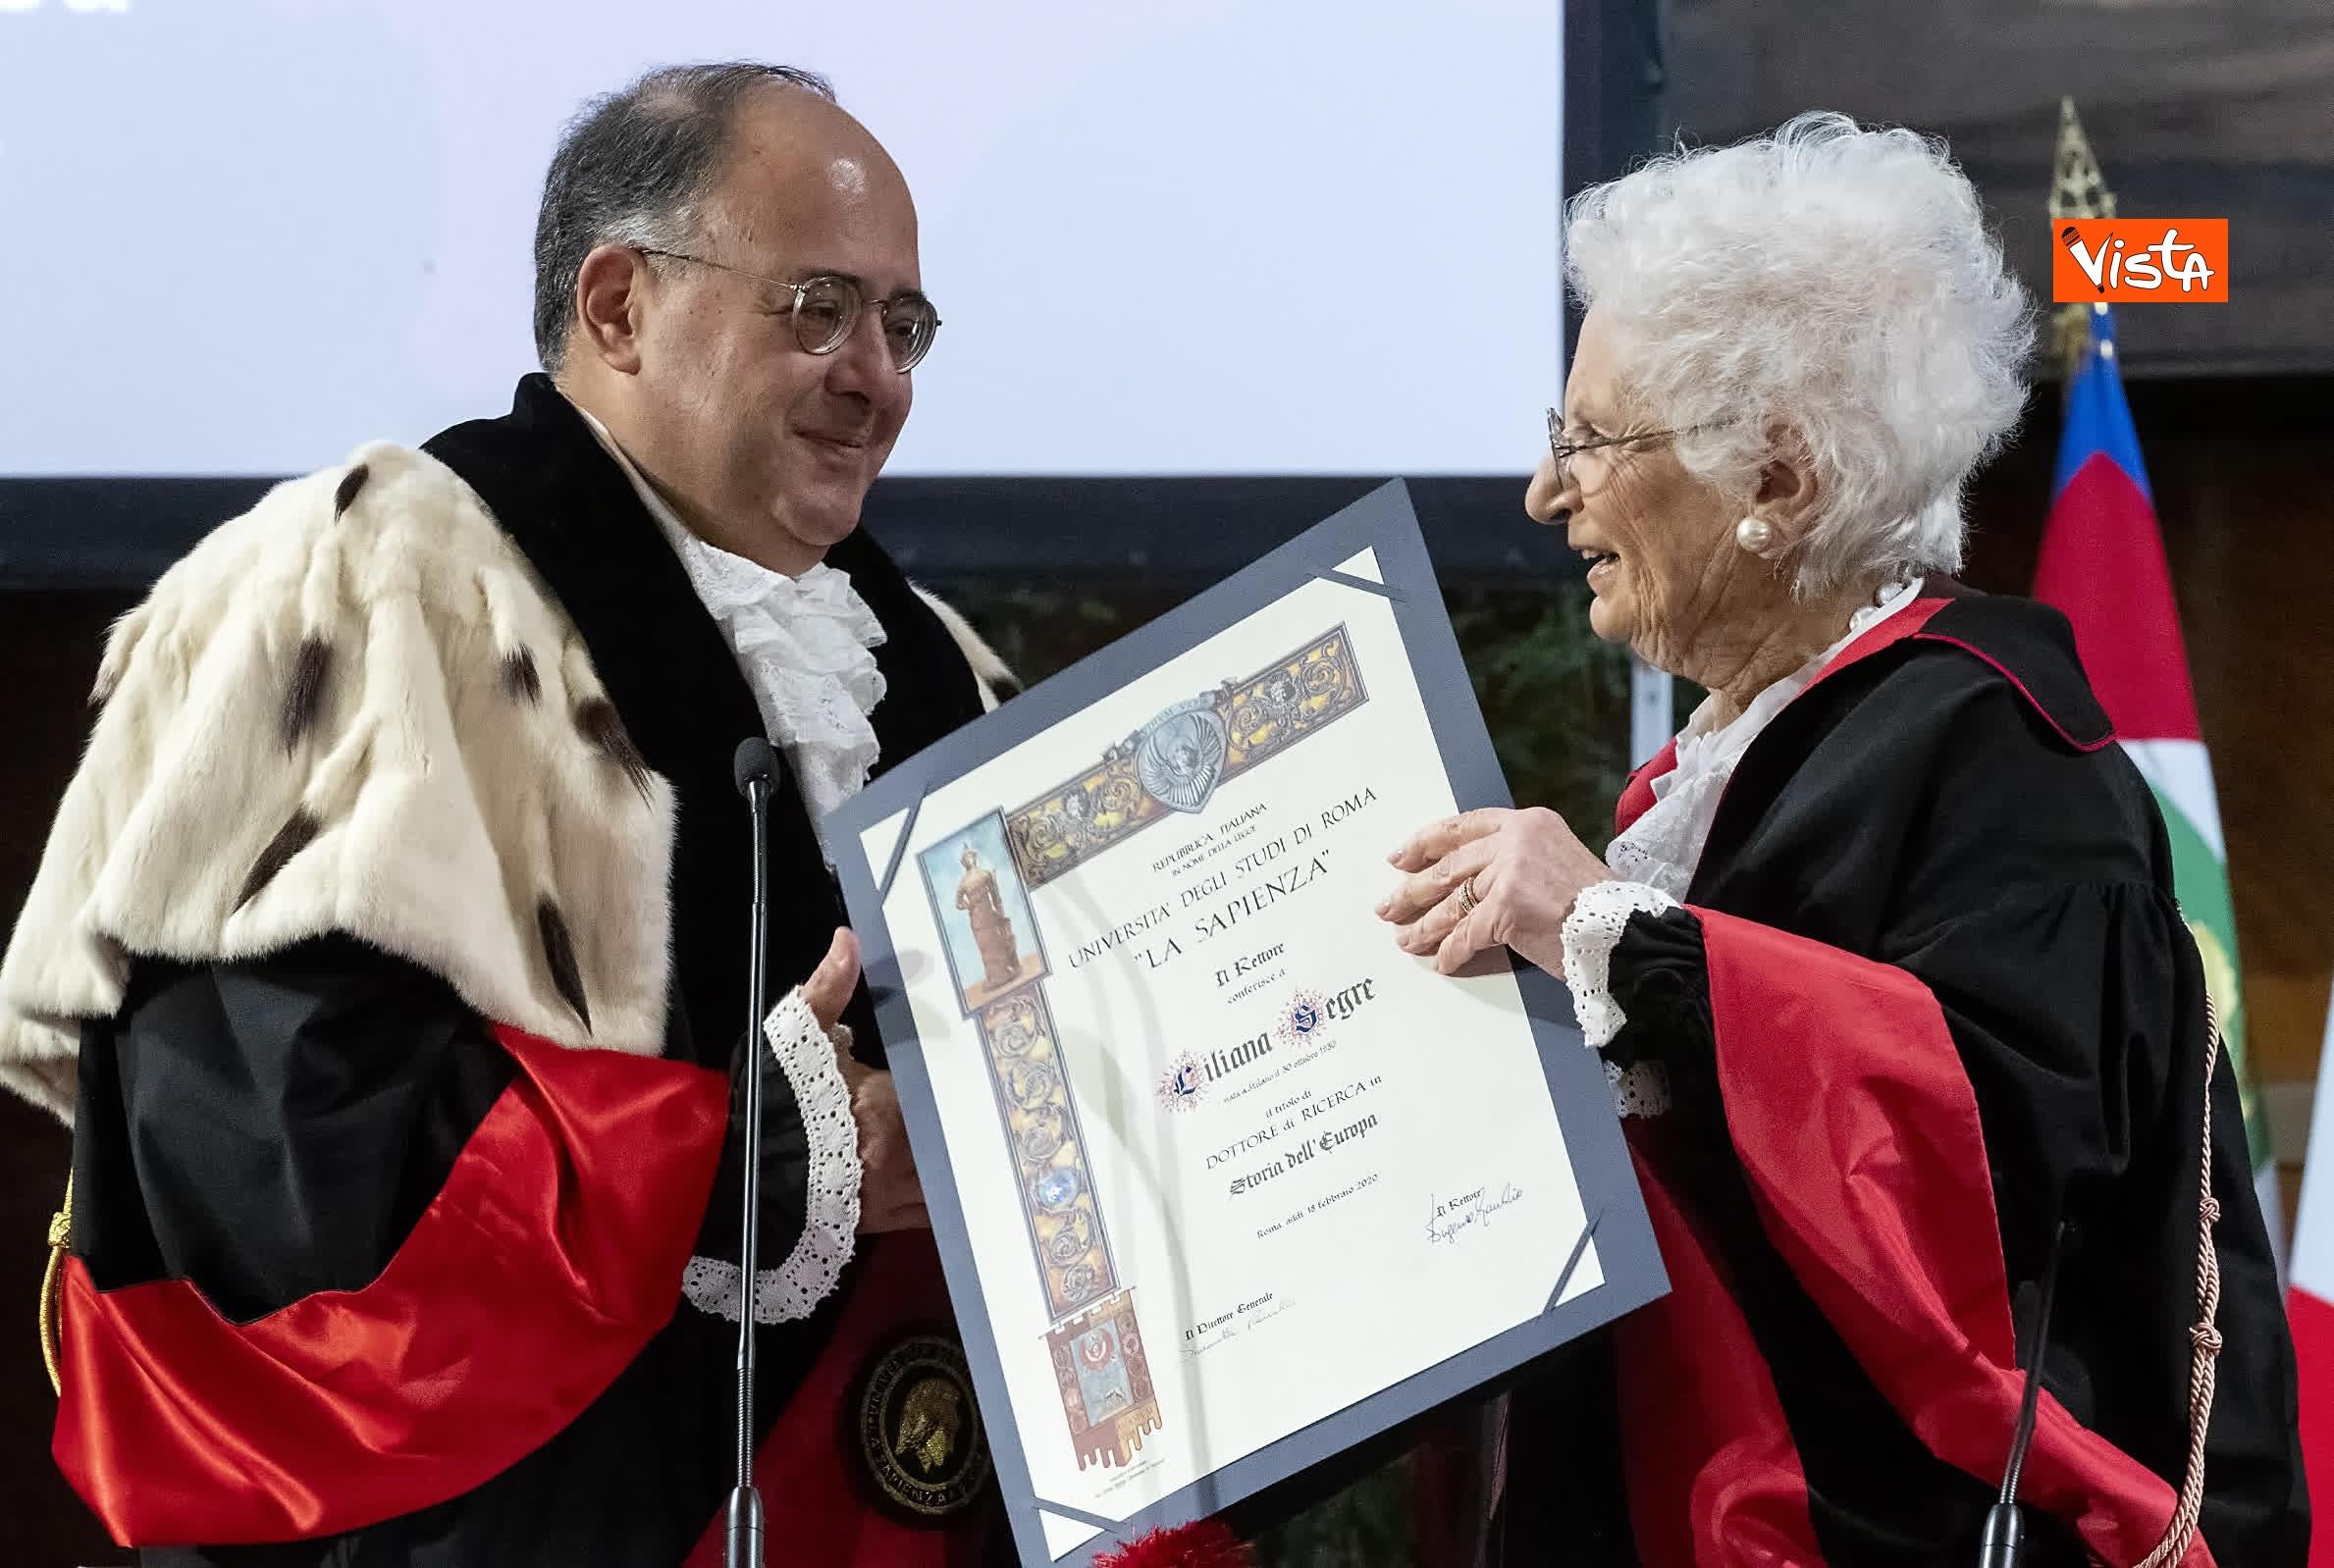 17-02-20 Segre riceve laurea honoris causa dal rettore della Sapienza Gaudio_05